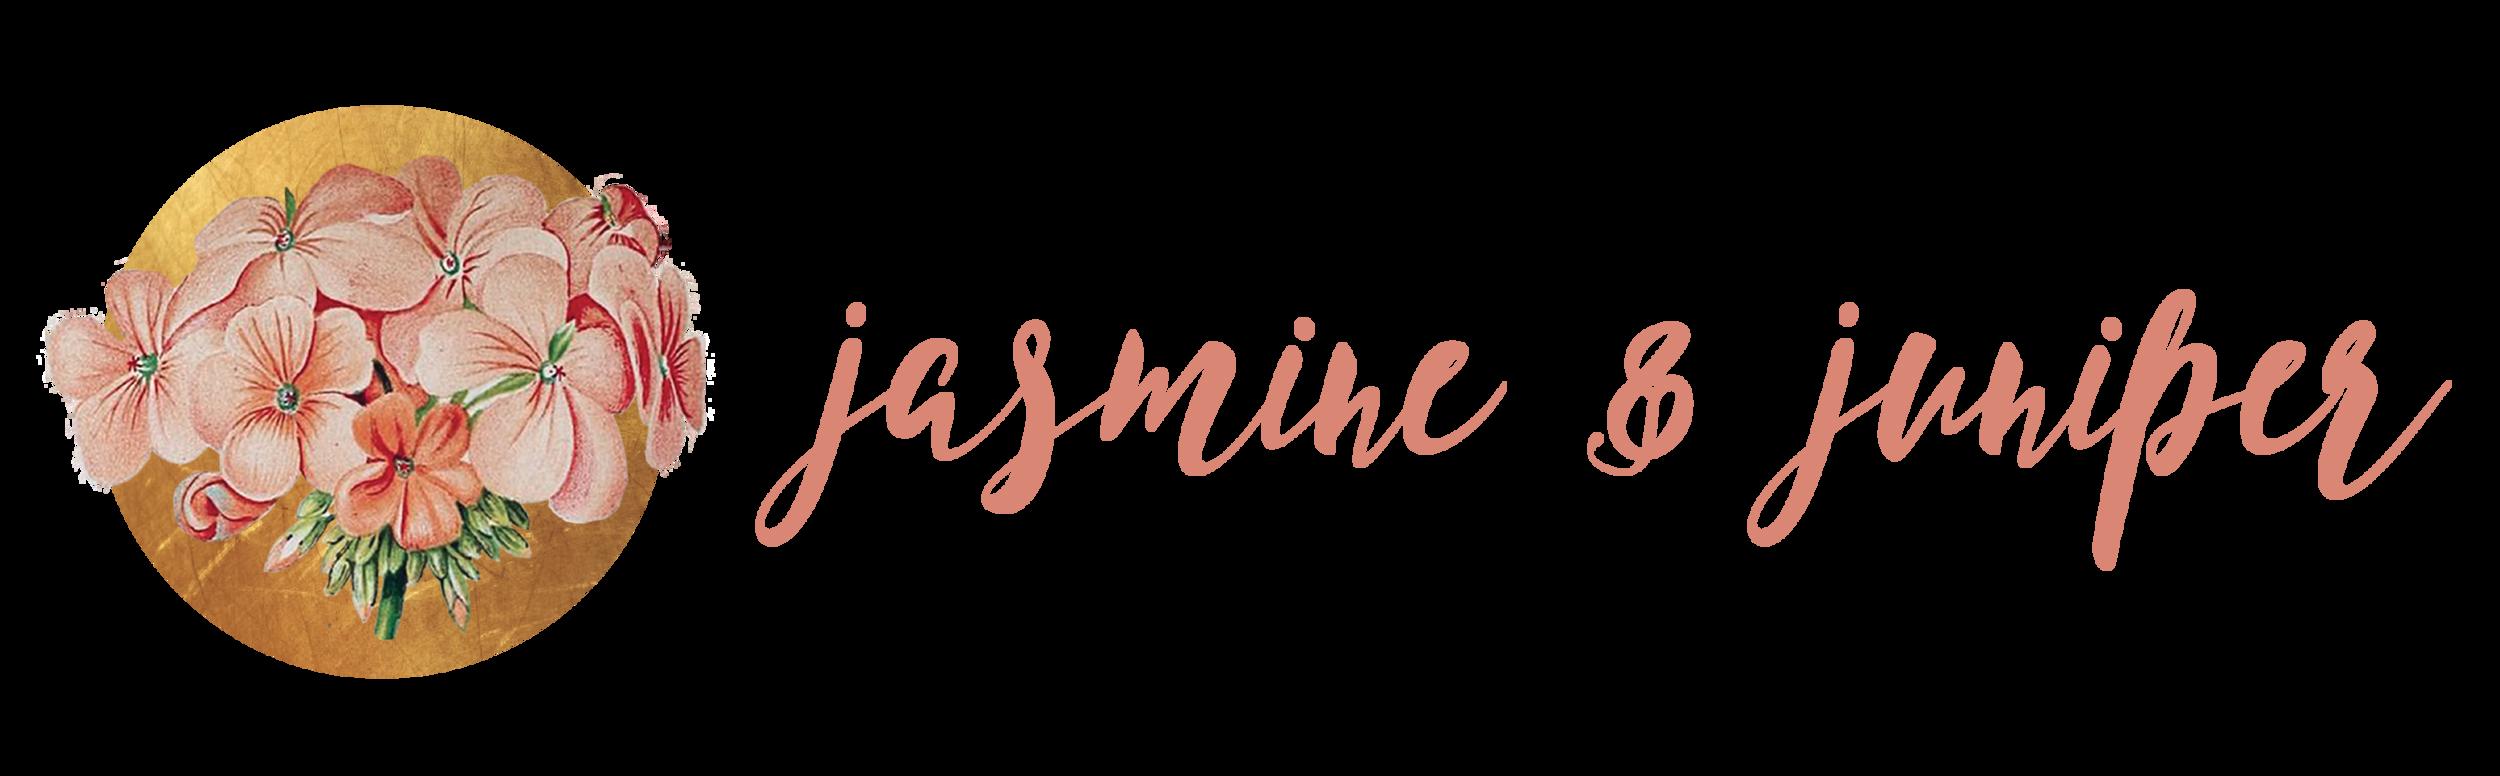 full-logo-2018-transparent-horiz-pink (1).png